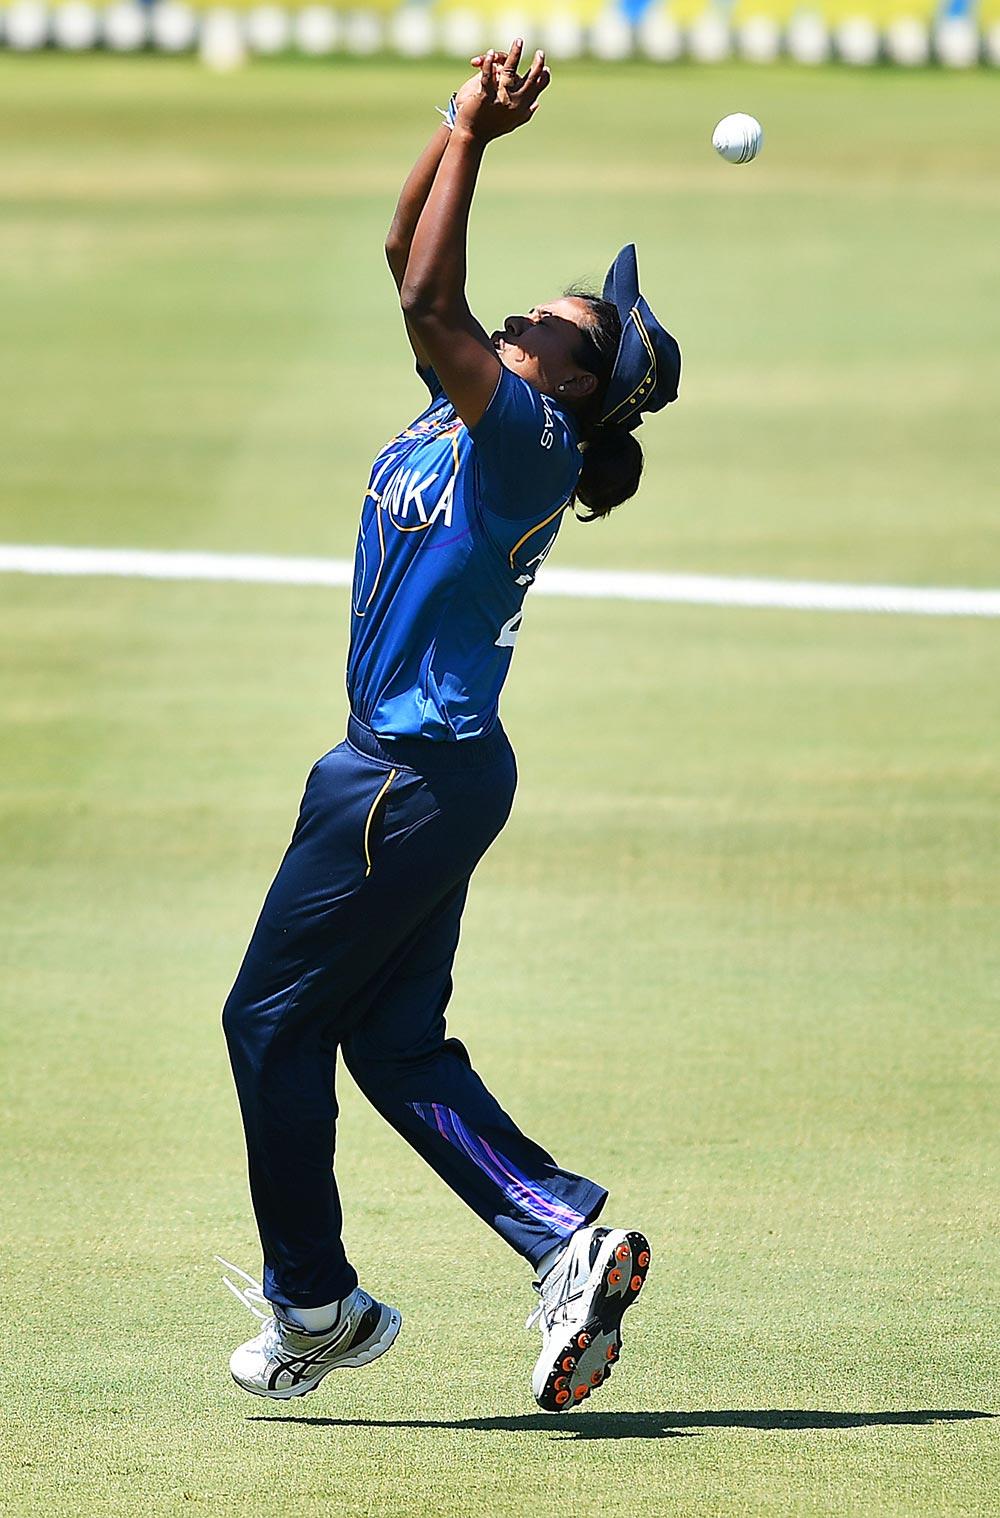 Achini Kulasuriya misjudges a catch attempt and is struck // ICC/Getty